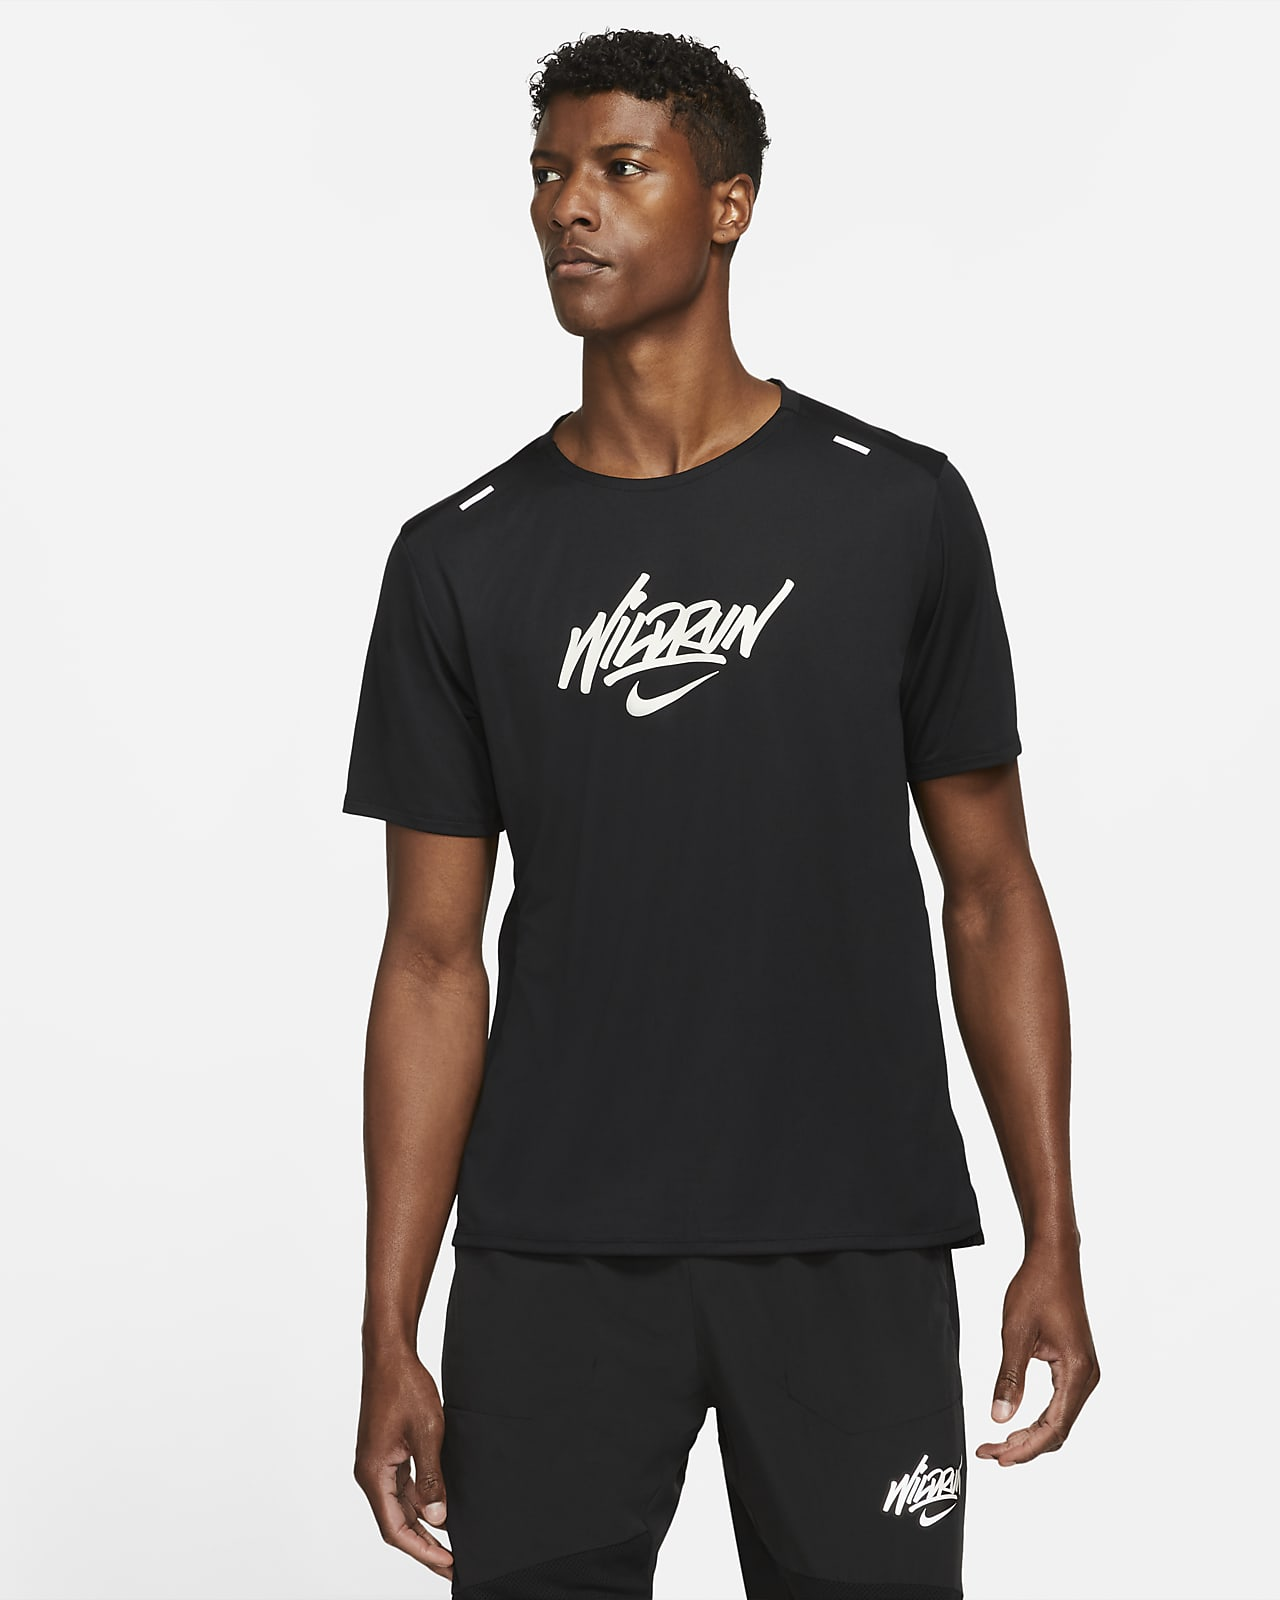 Camiseta de running de manga corta para hombre Nike Rise 365 Wild Run